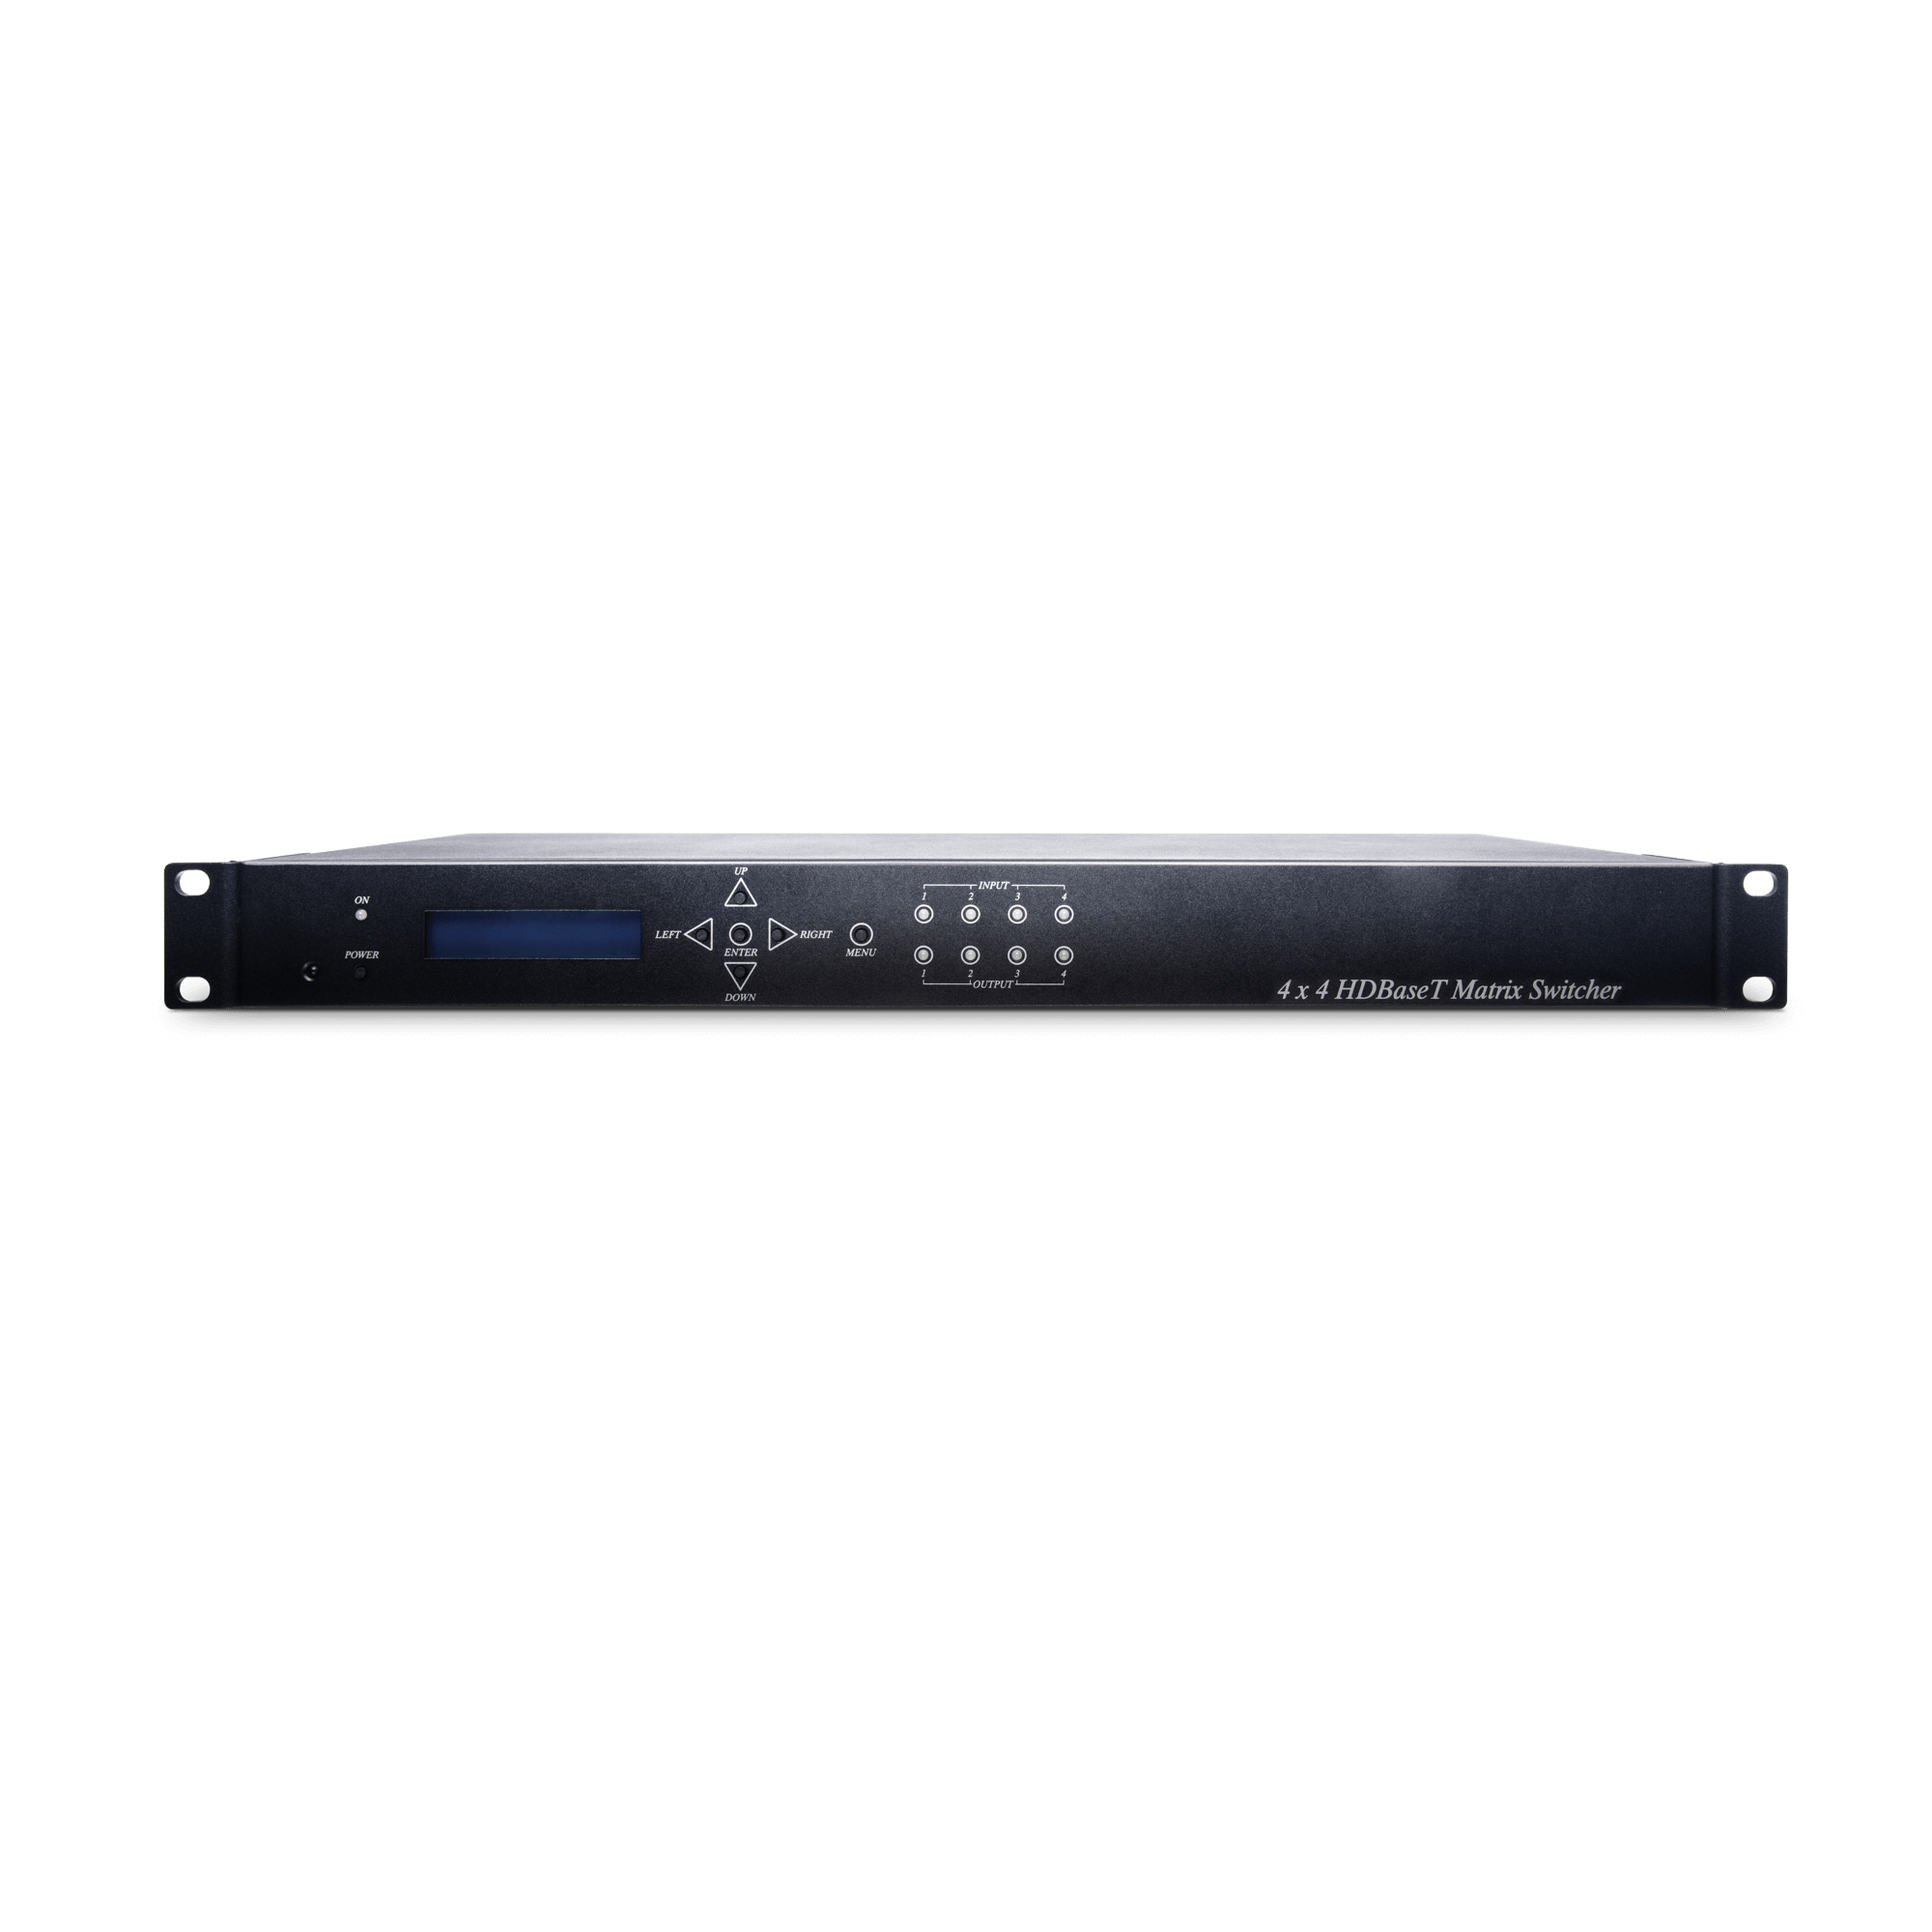 4 x 4 HDMI (HDBaseT)CAT5e Matrix Switcher